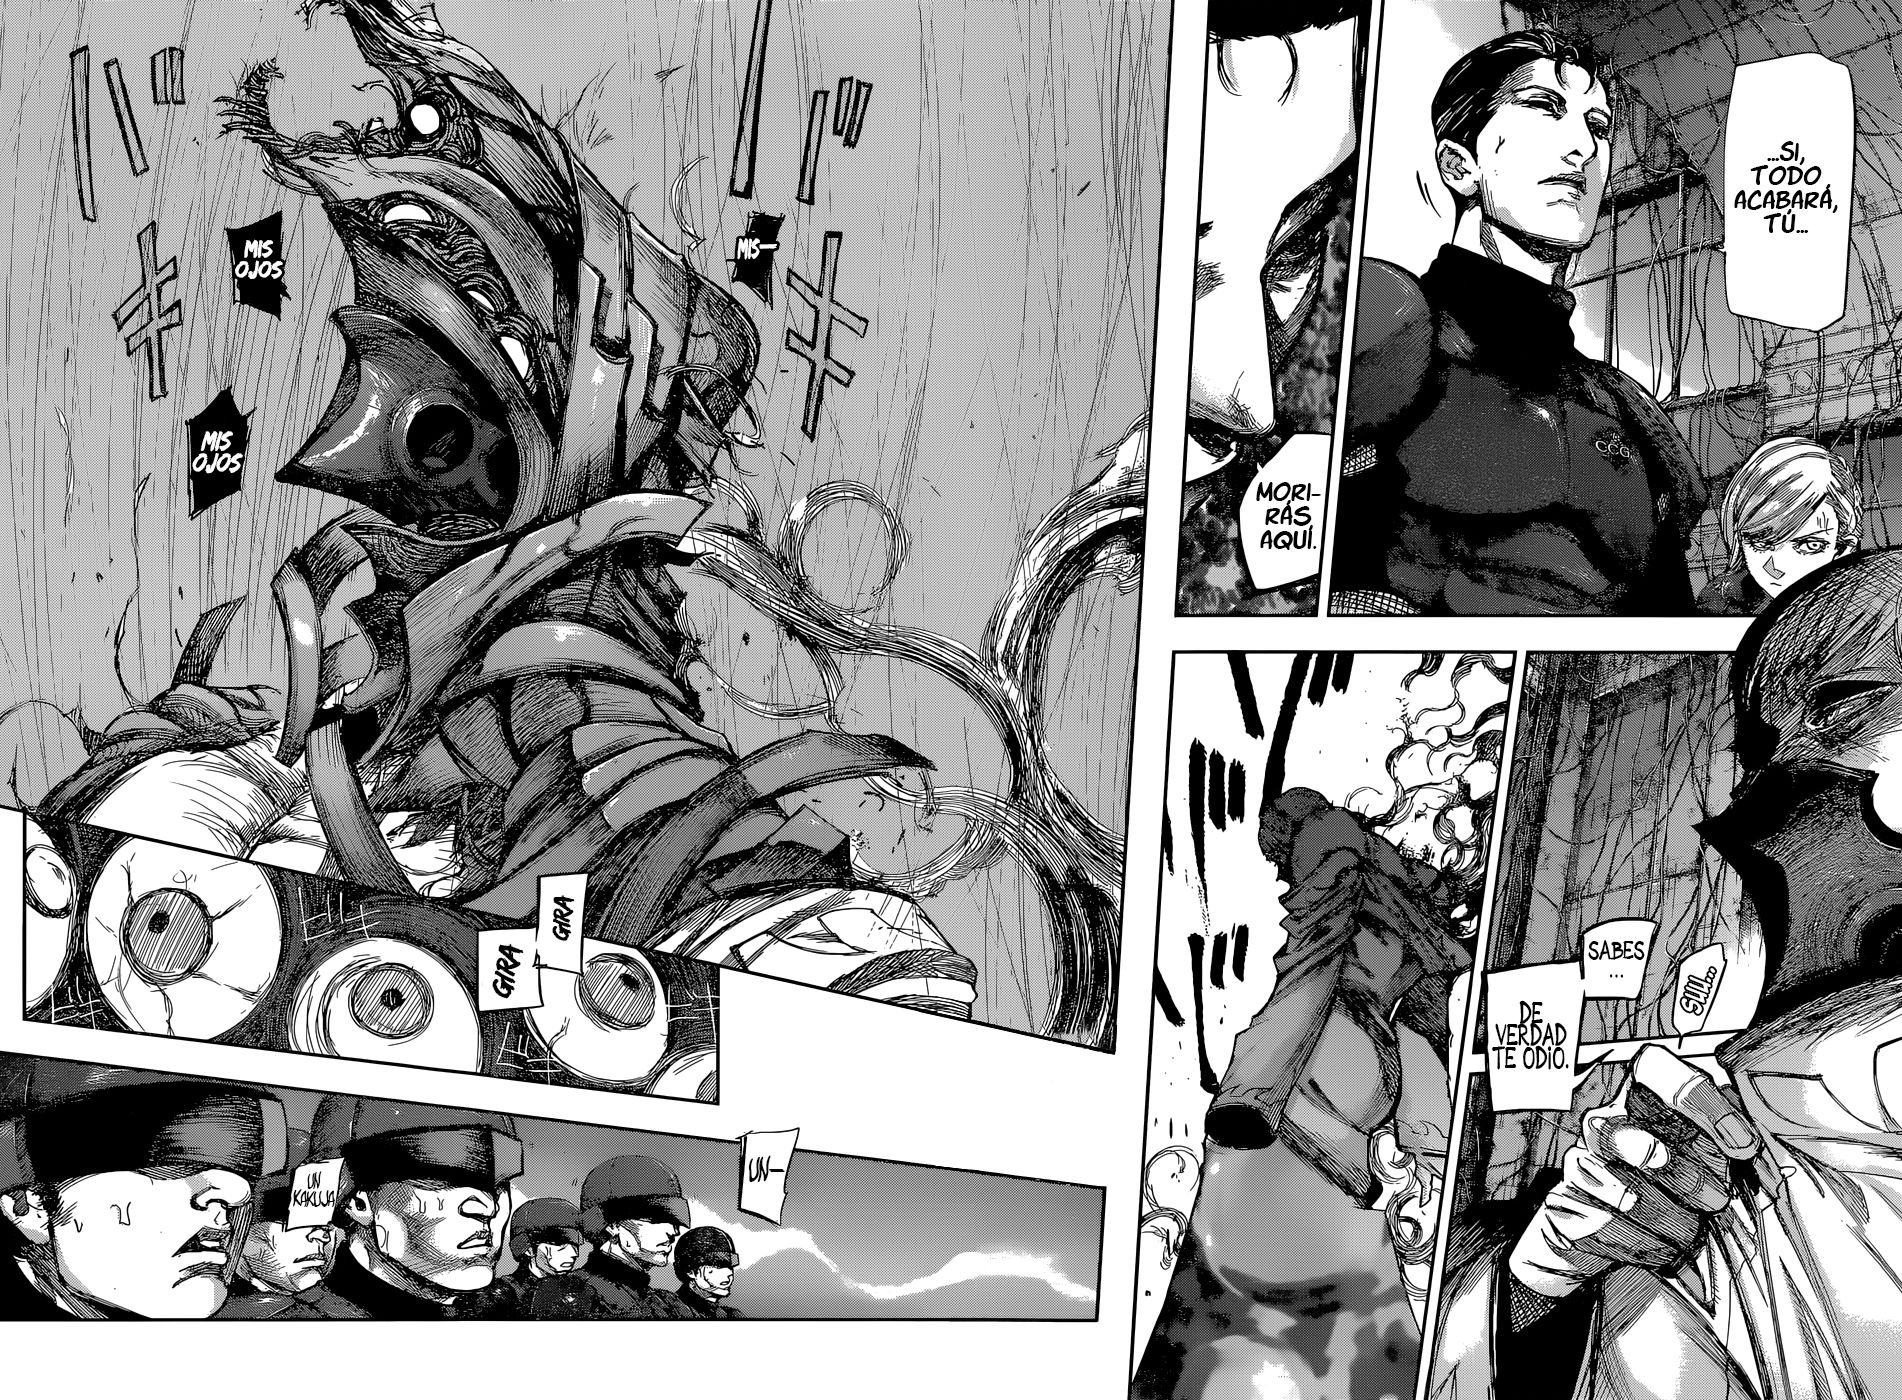 https://c5.ninemanga.com/es_manga/59/59/488038/2ab0d800860461475f59d866202dc6d9.jpg Page 3